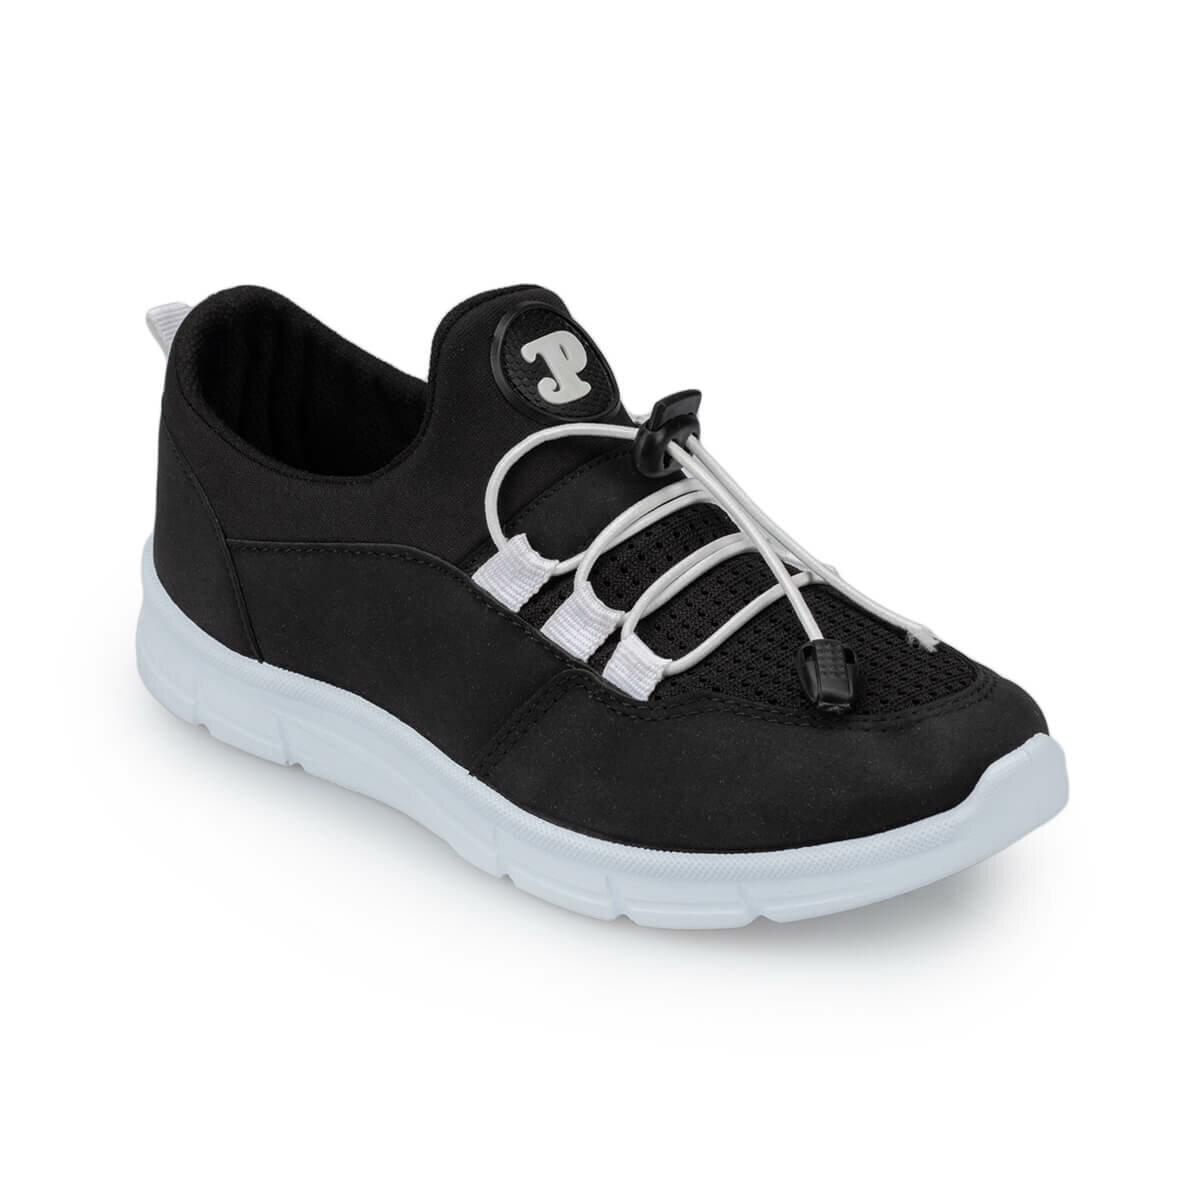 FLO 91.511205.F Black Male Child Hiking Shoes Polaris